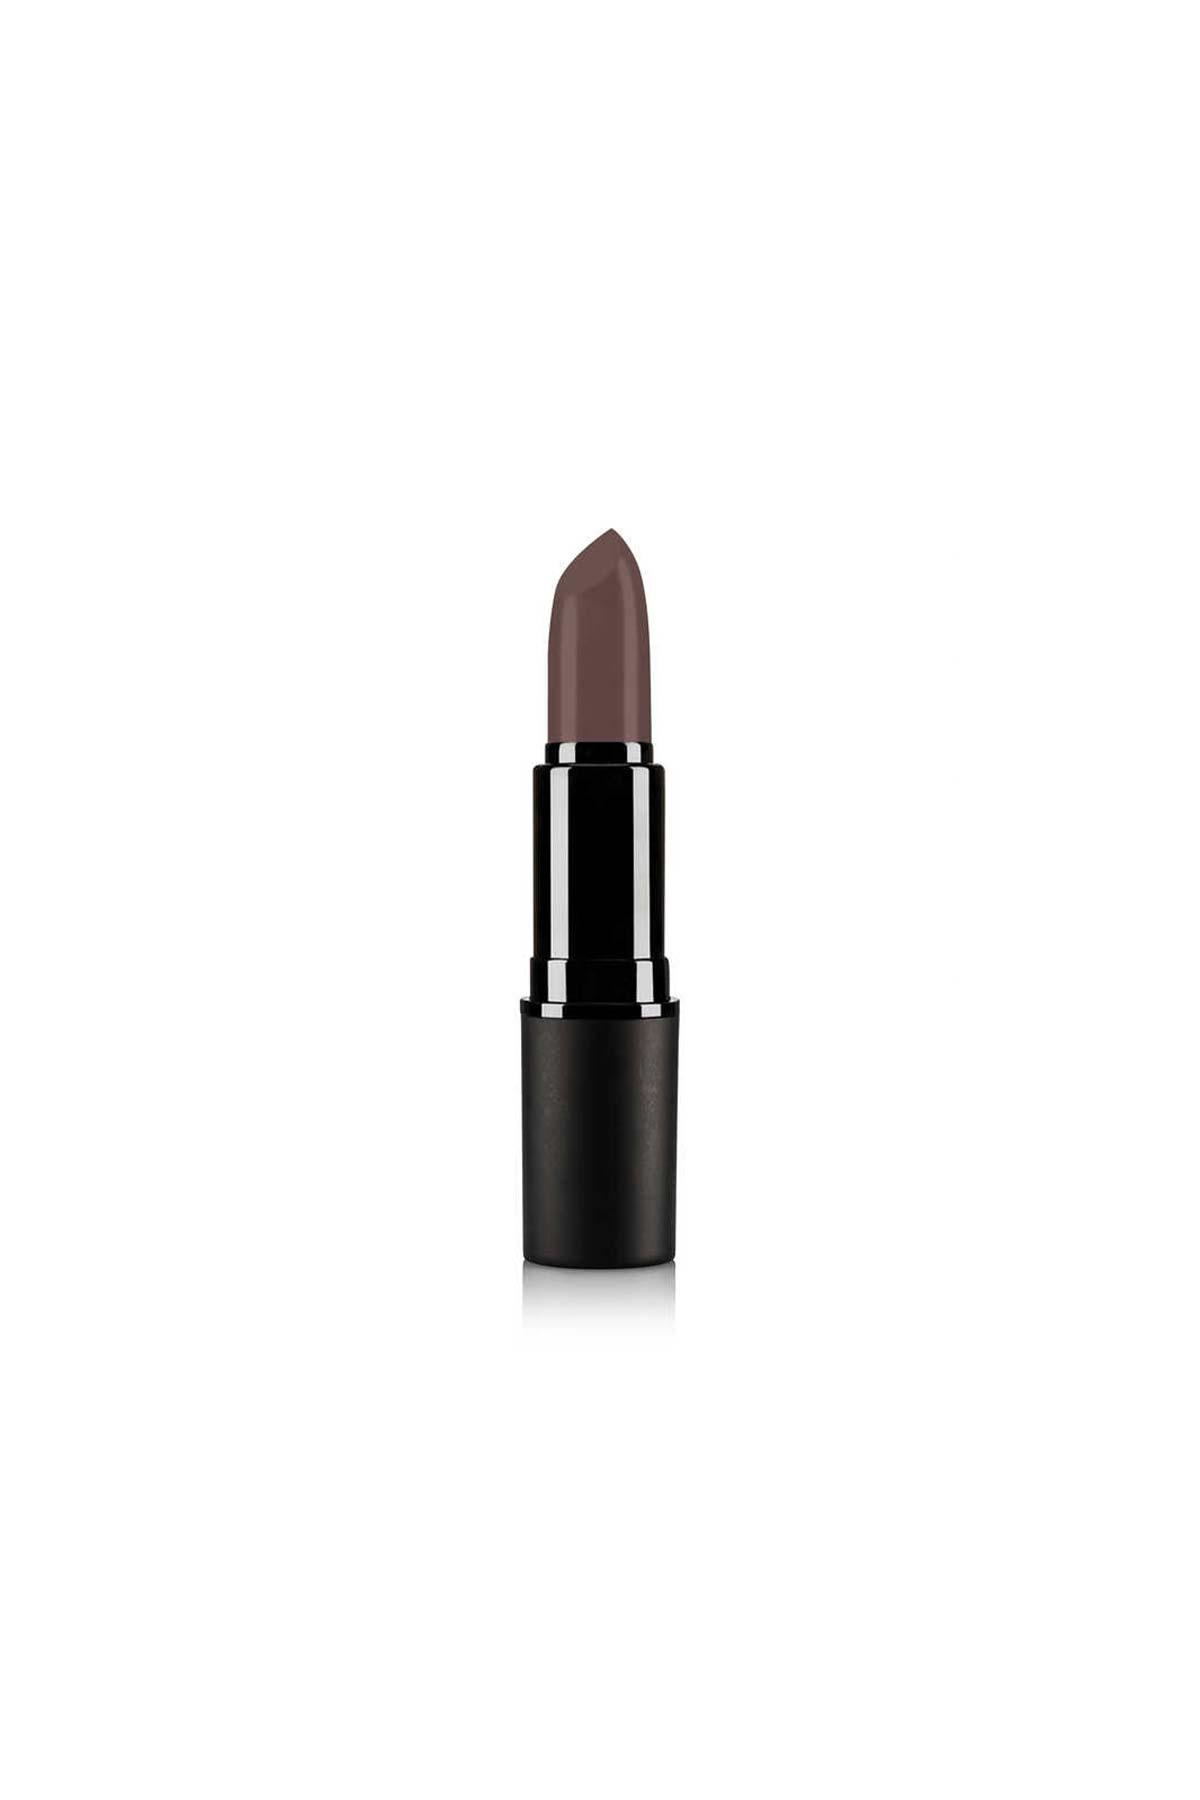 Matte Lipstick - 180 -Ruj - Lipstick Thumbnail